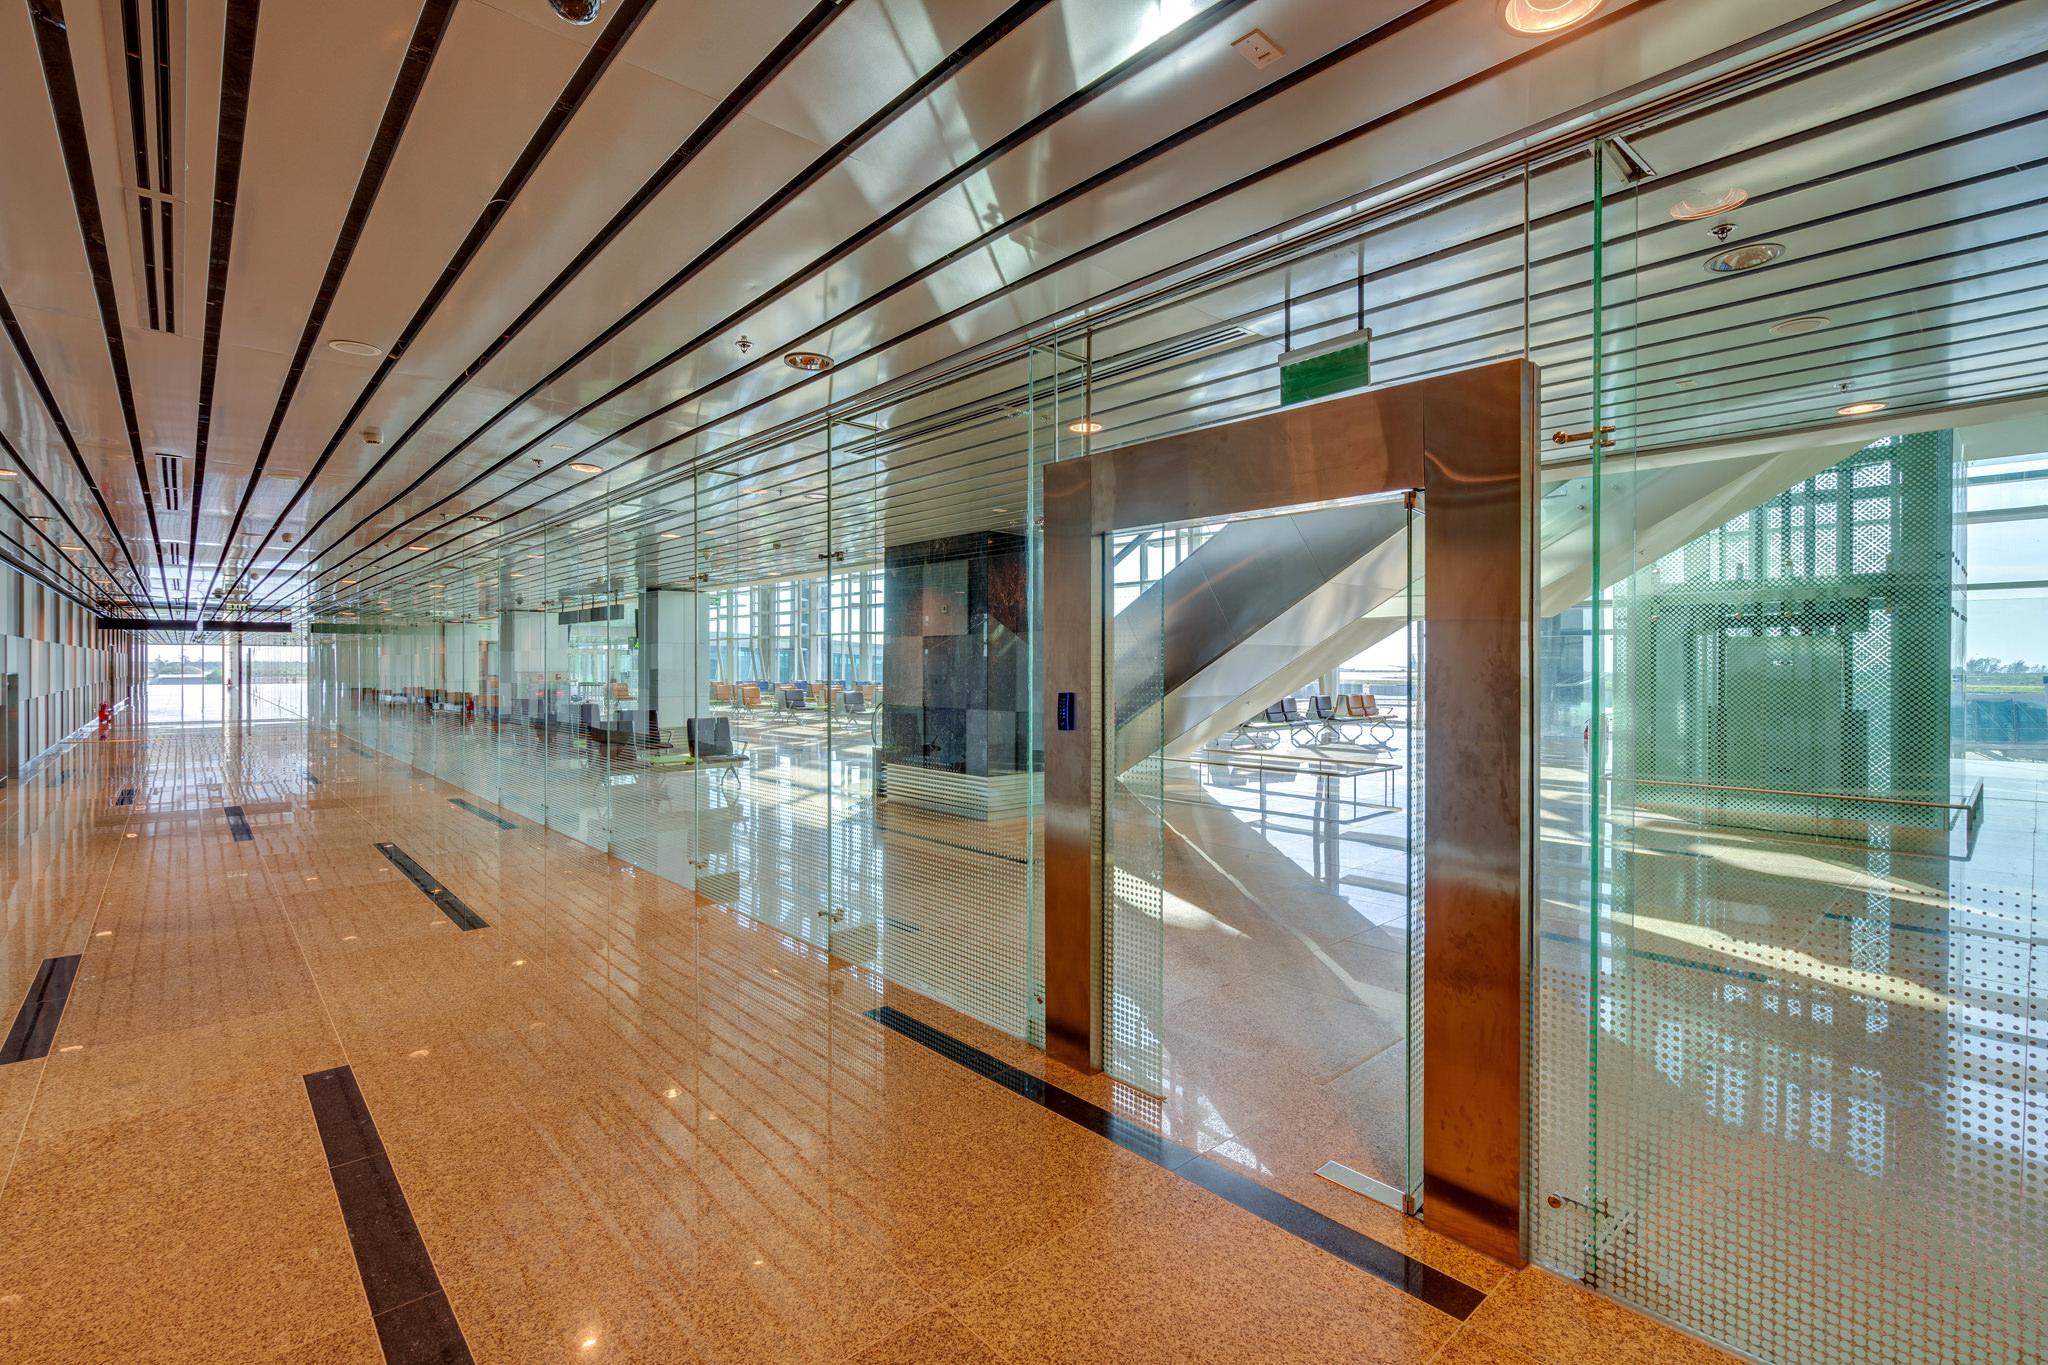 20180626 - Cam Ranh Airport - Architecture - 0169.jpg